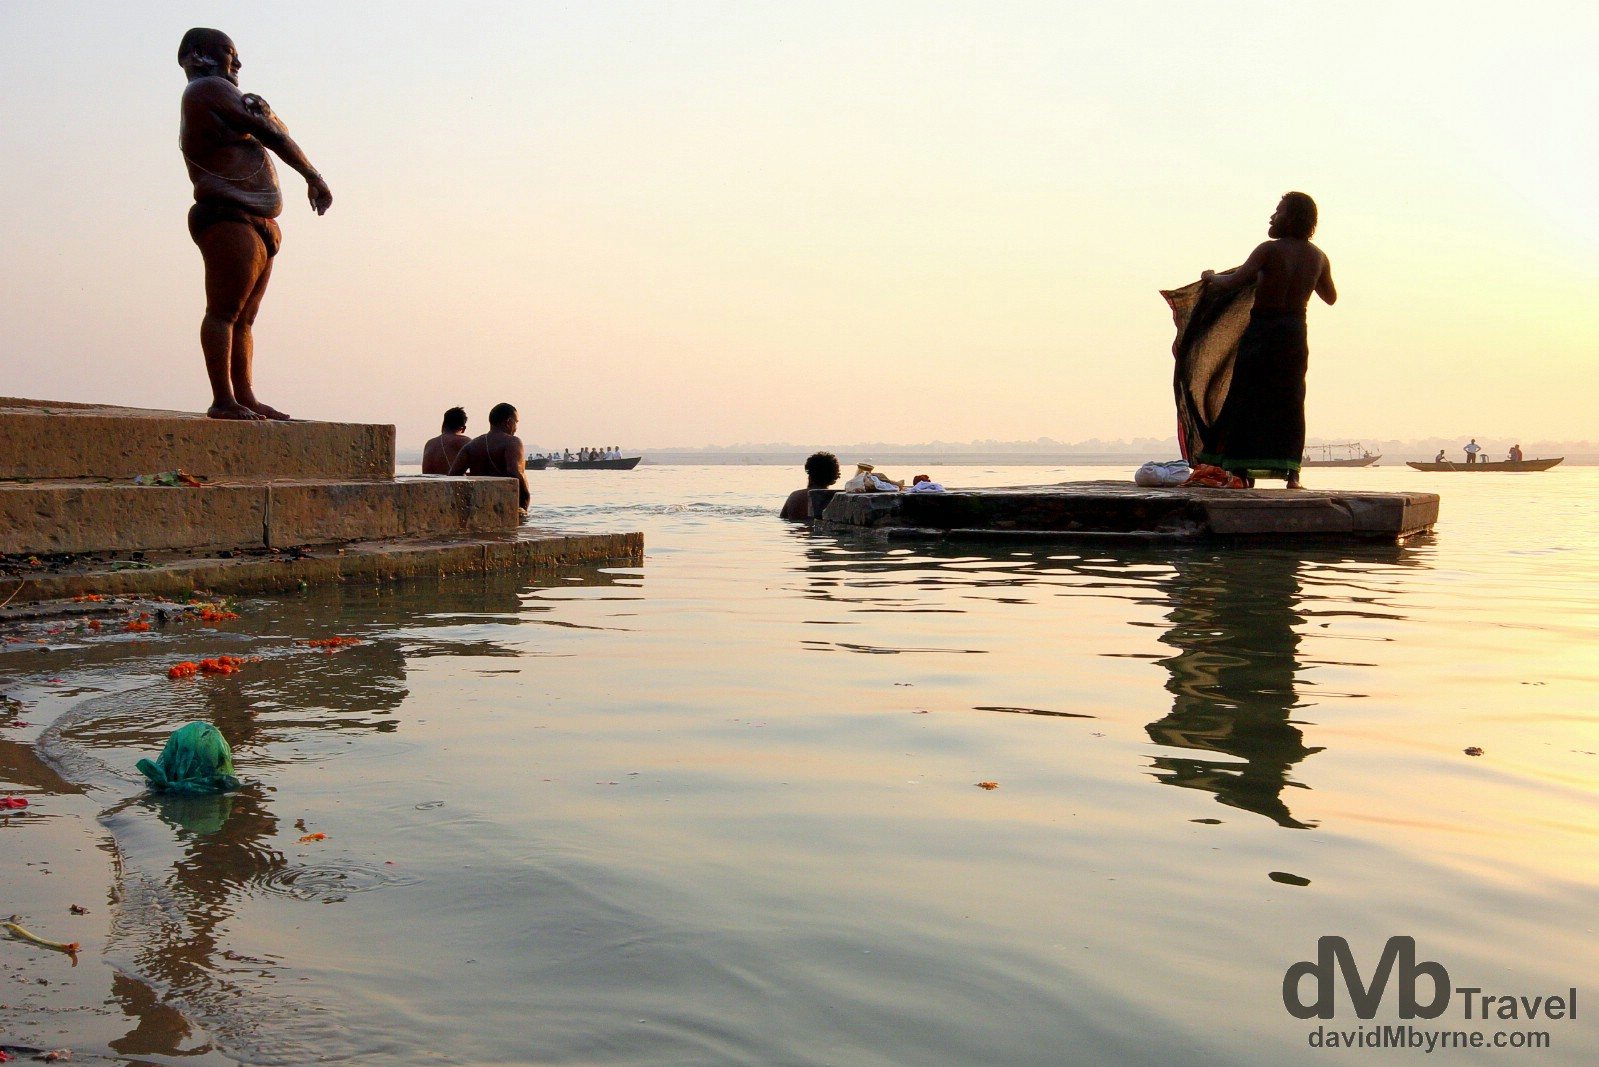 Bathing in the Ganges River at sunrise in Varanasi, Uttar Pradesh, India. October 14th 2012.